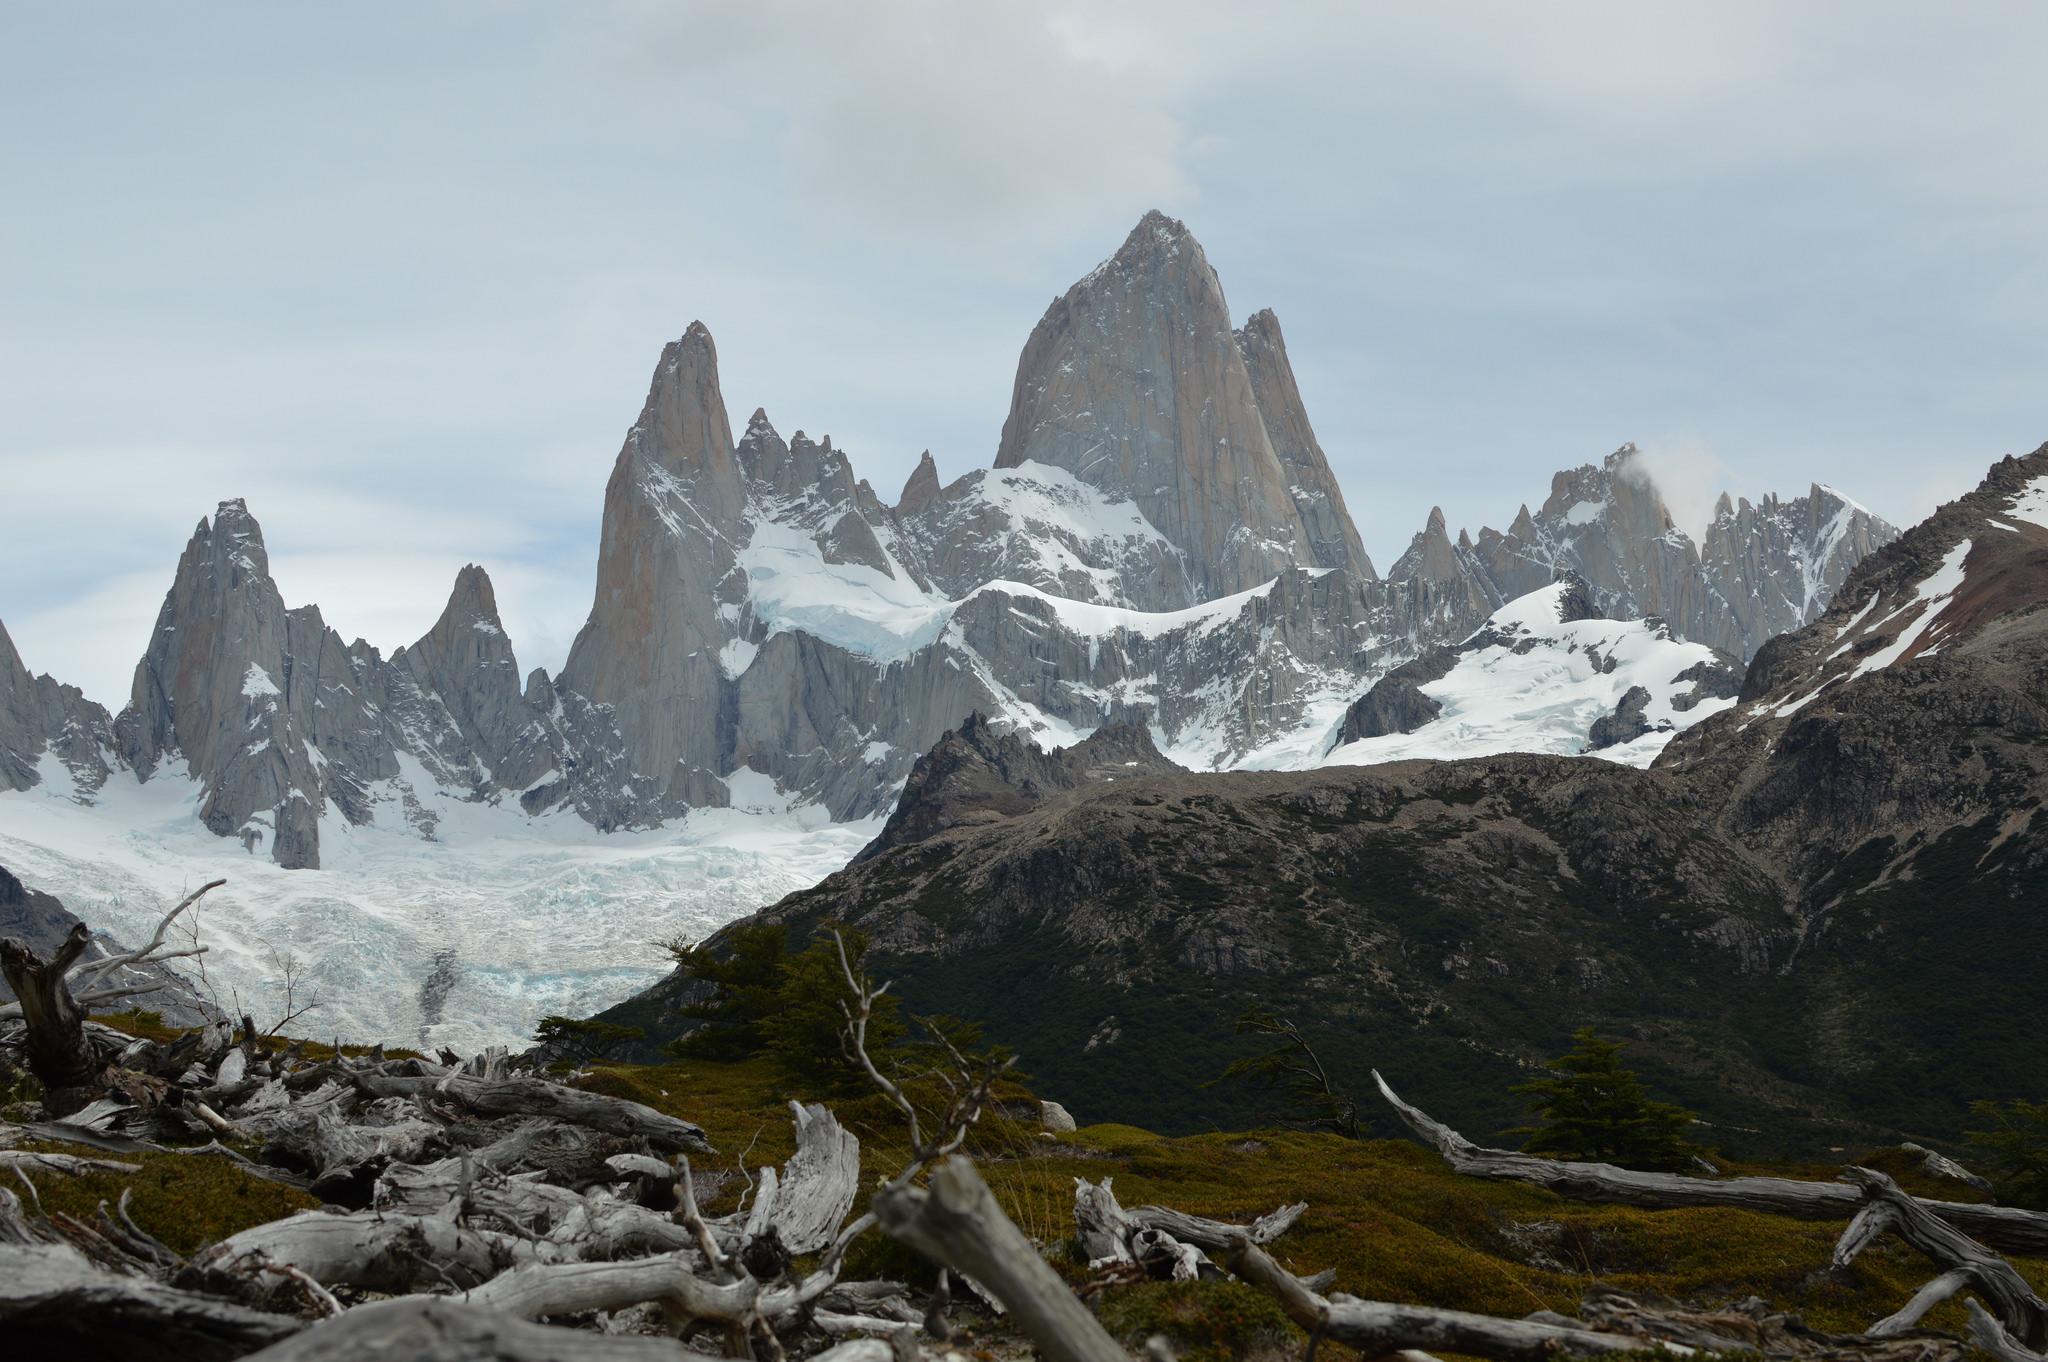 Mt. Fitz Roy - El Chalten, Argentina